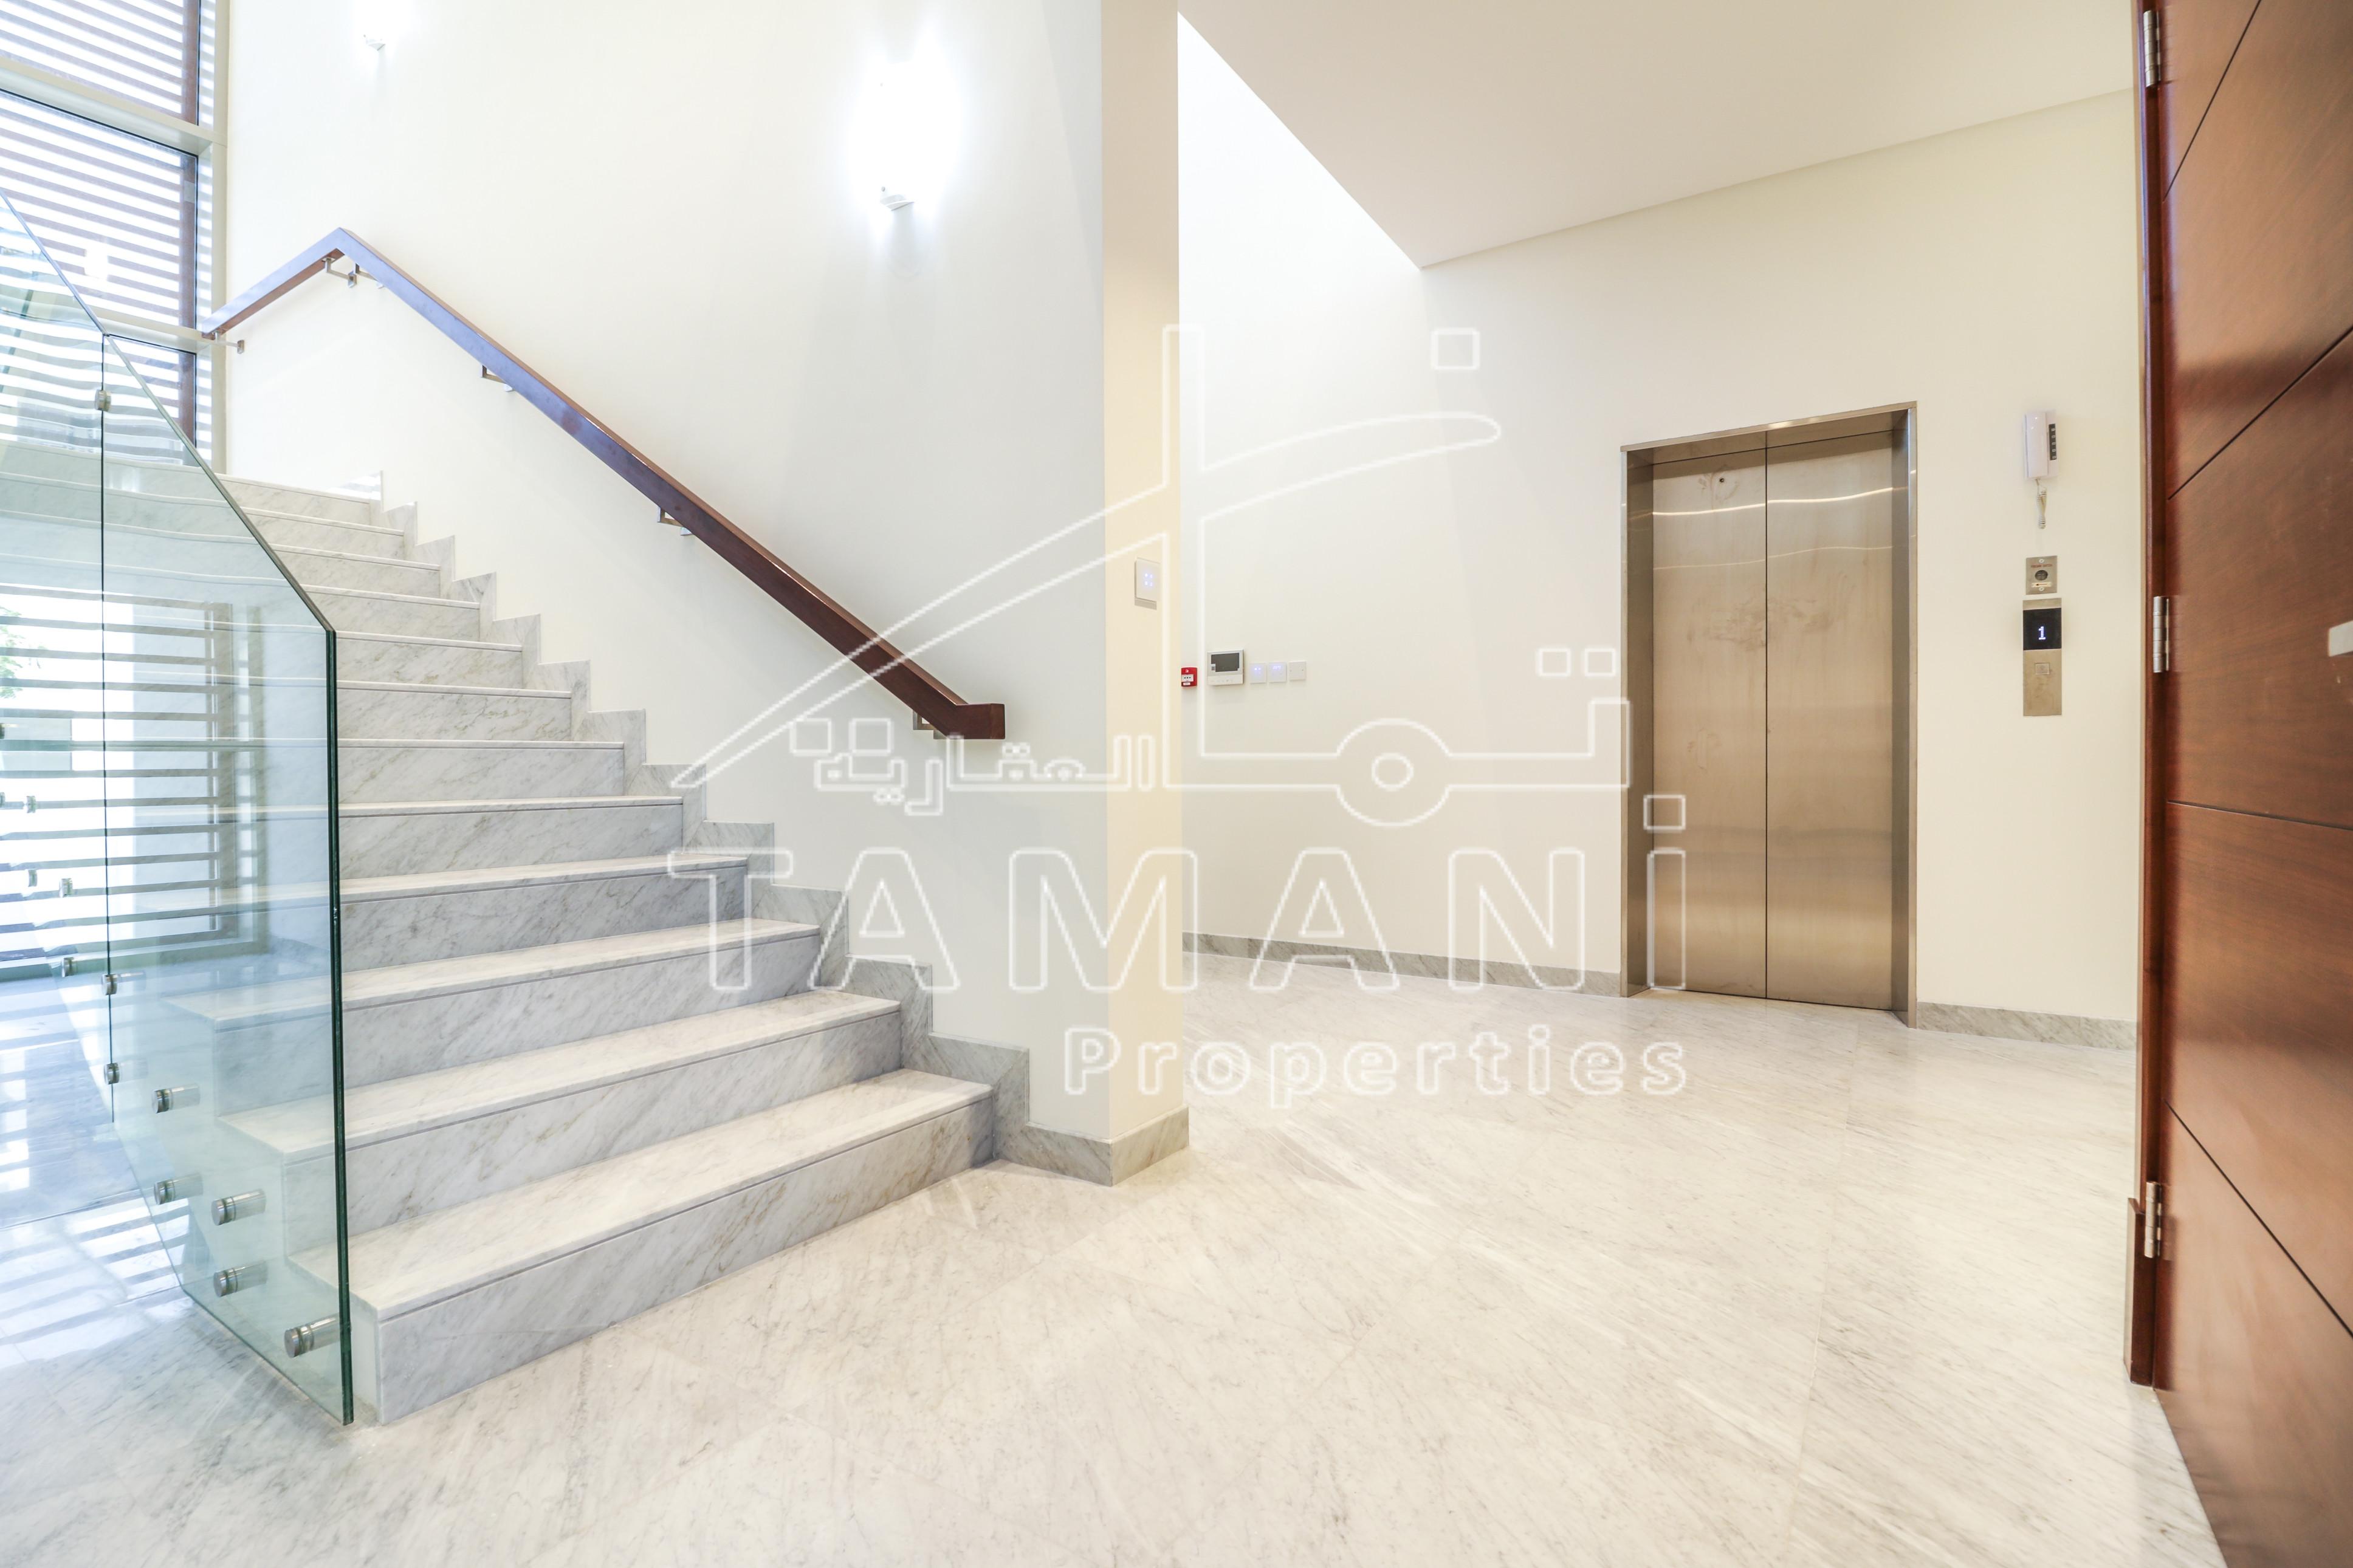 Elevator Contemporary Type B Corner Plot - District One